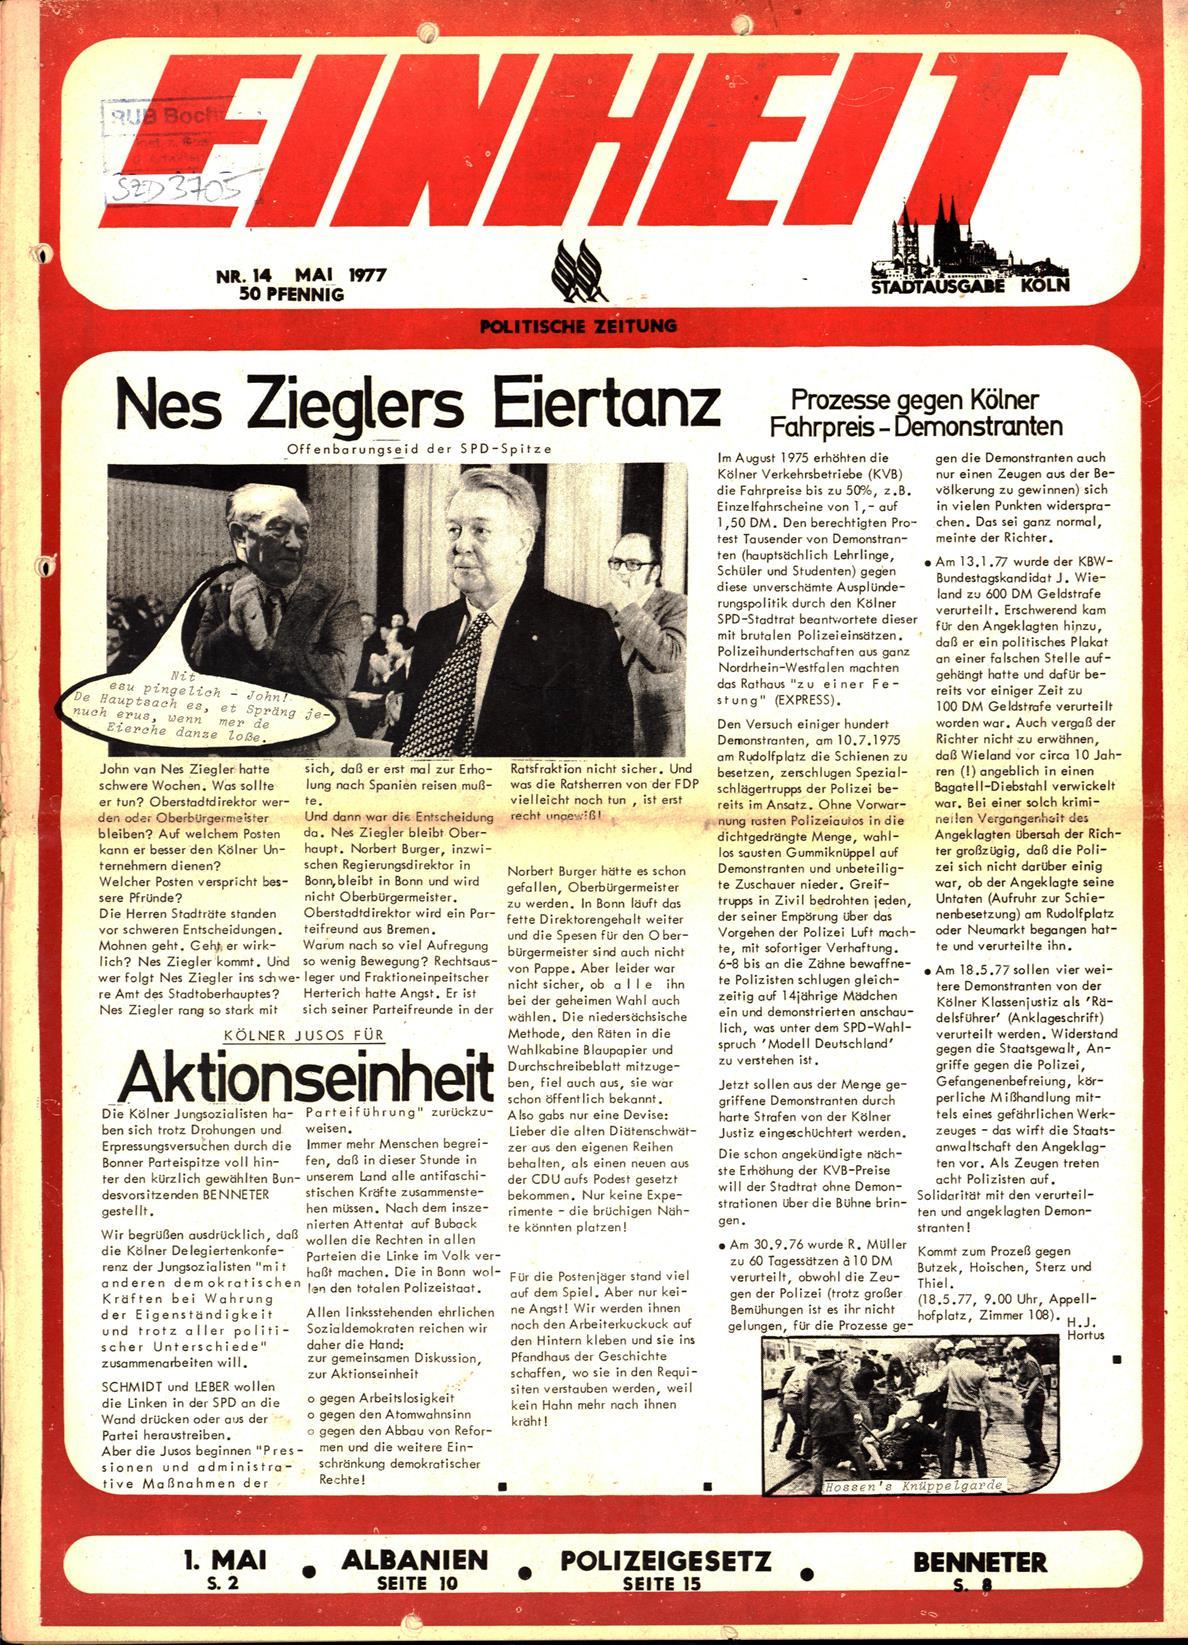 Koeln_IPdA_Einheit_1977_014_Stadt_001